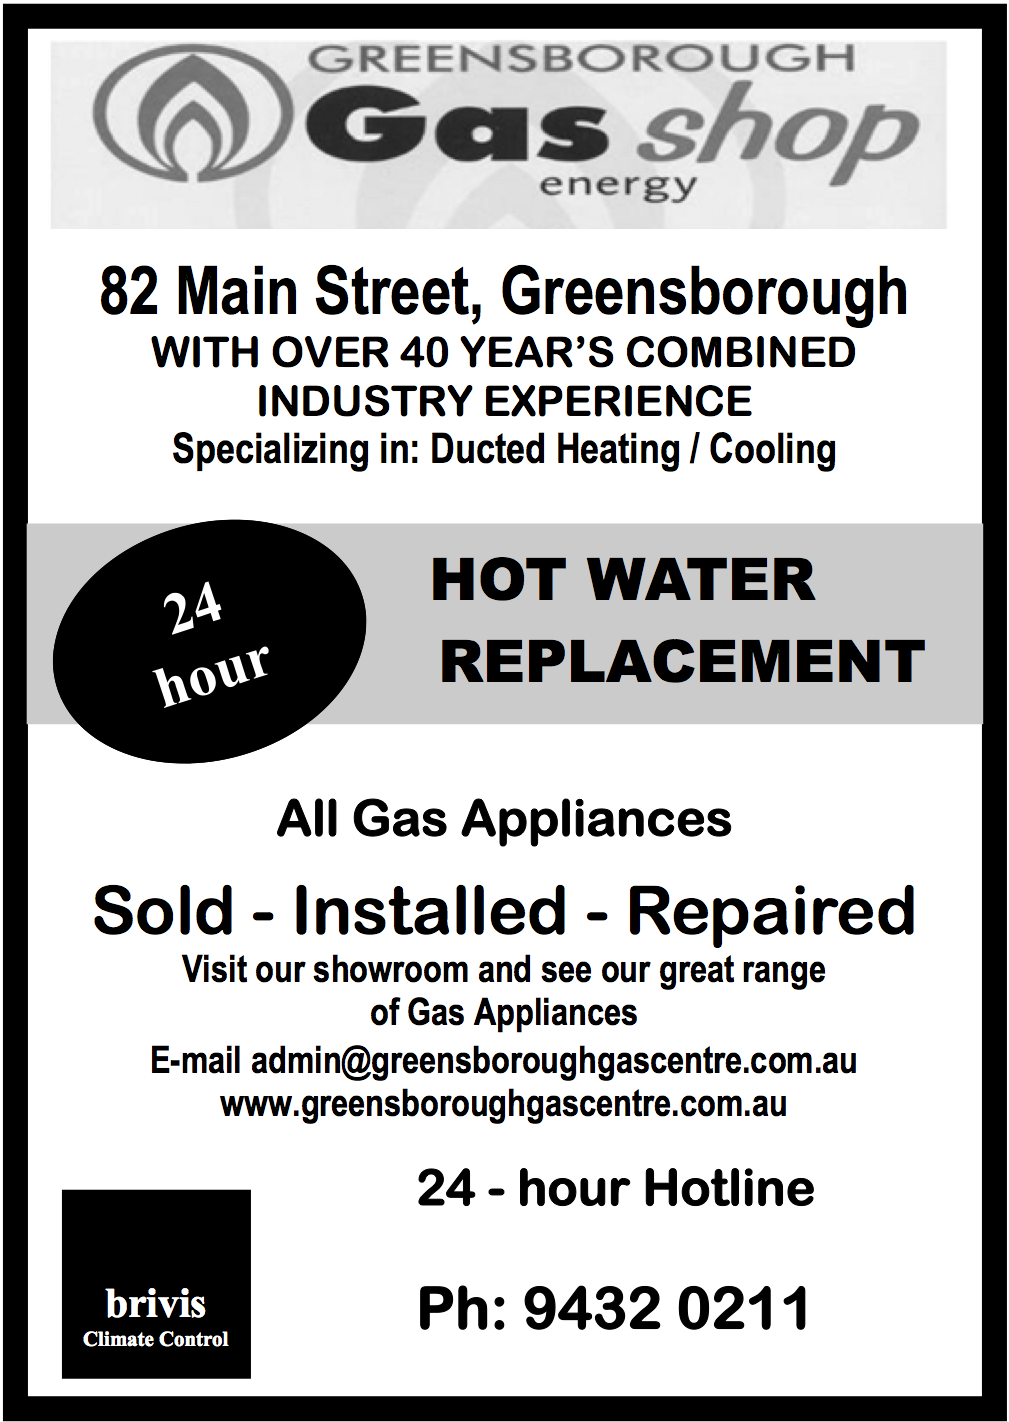 Greensborough Gas Shop